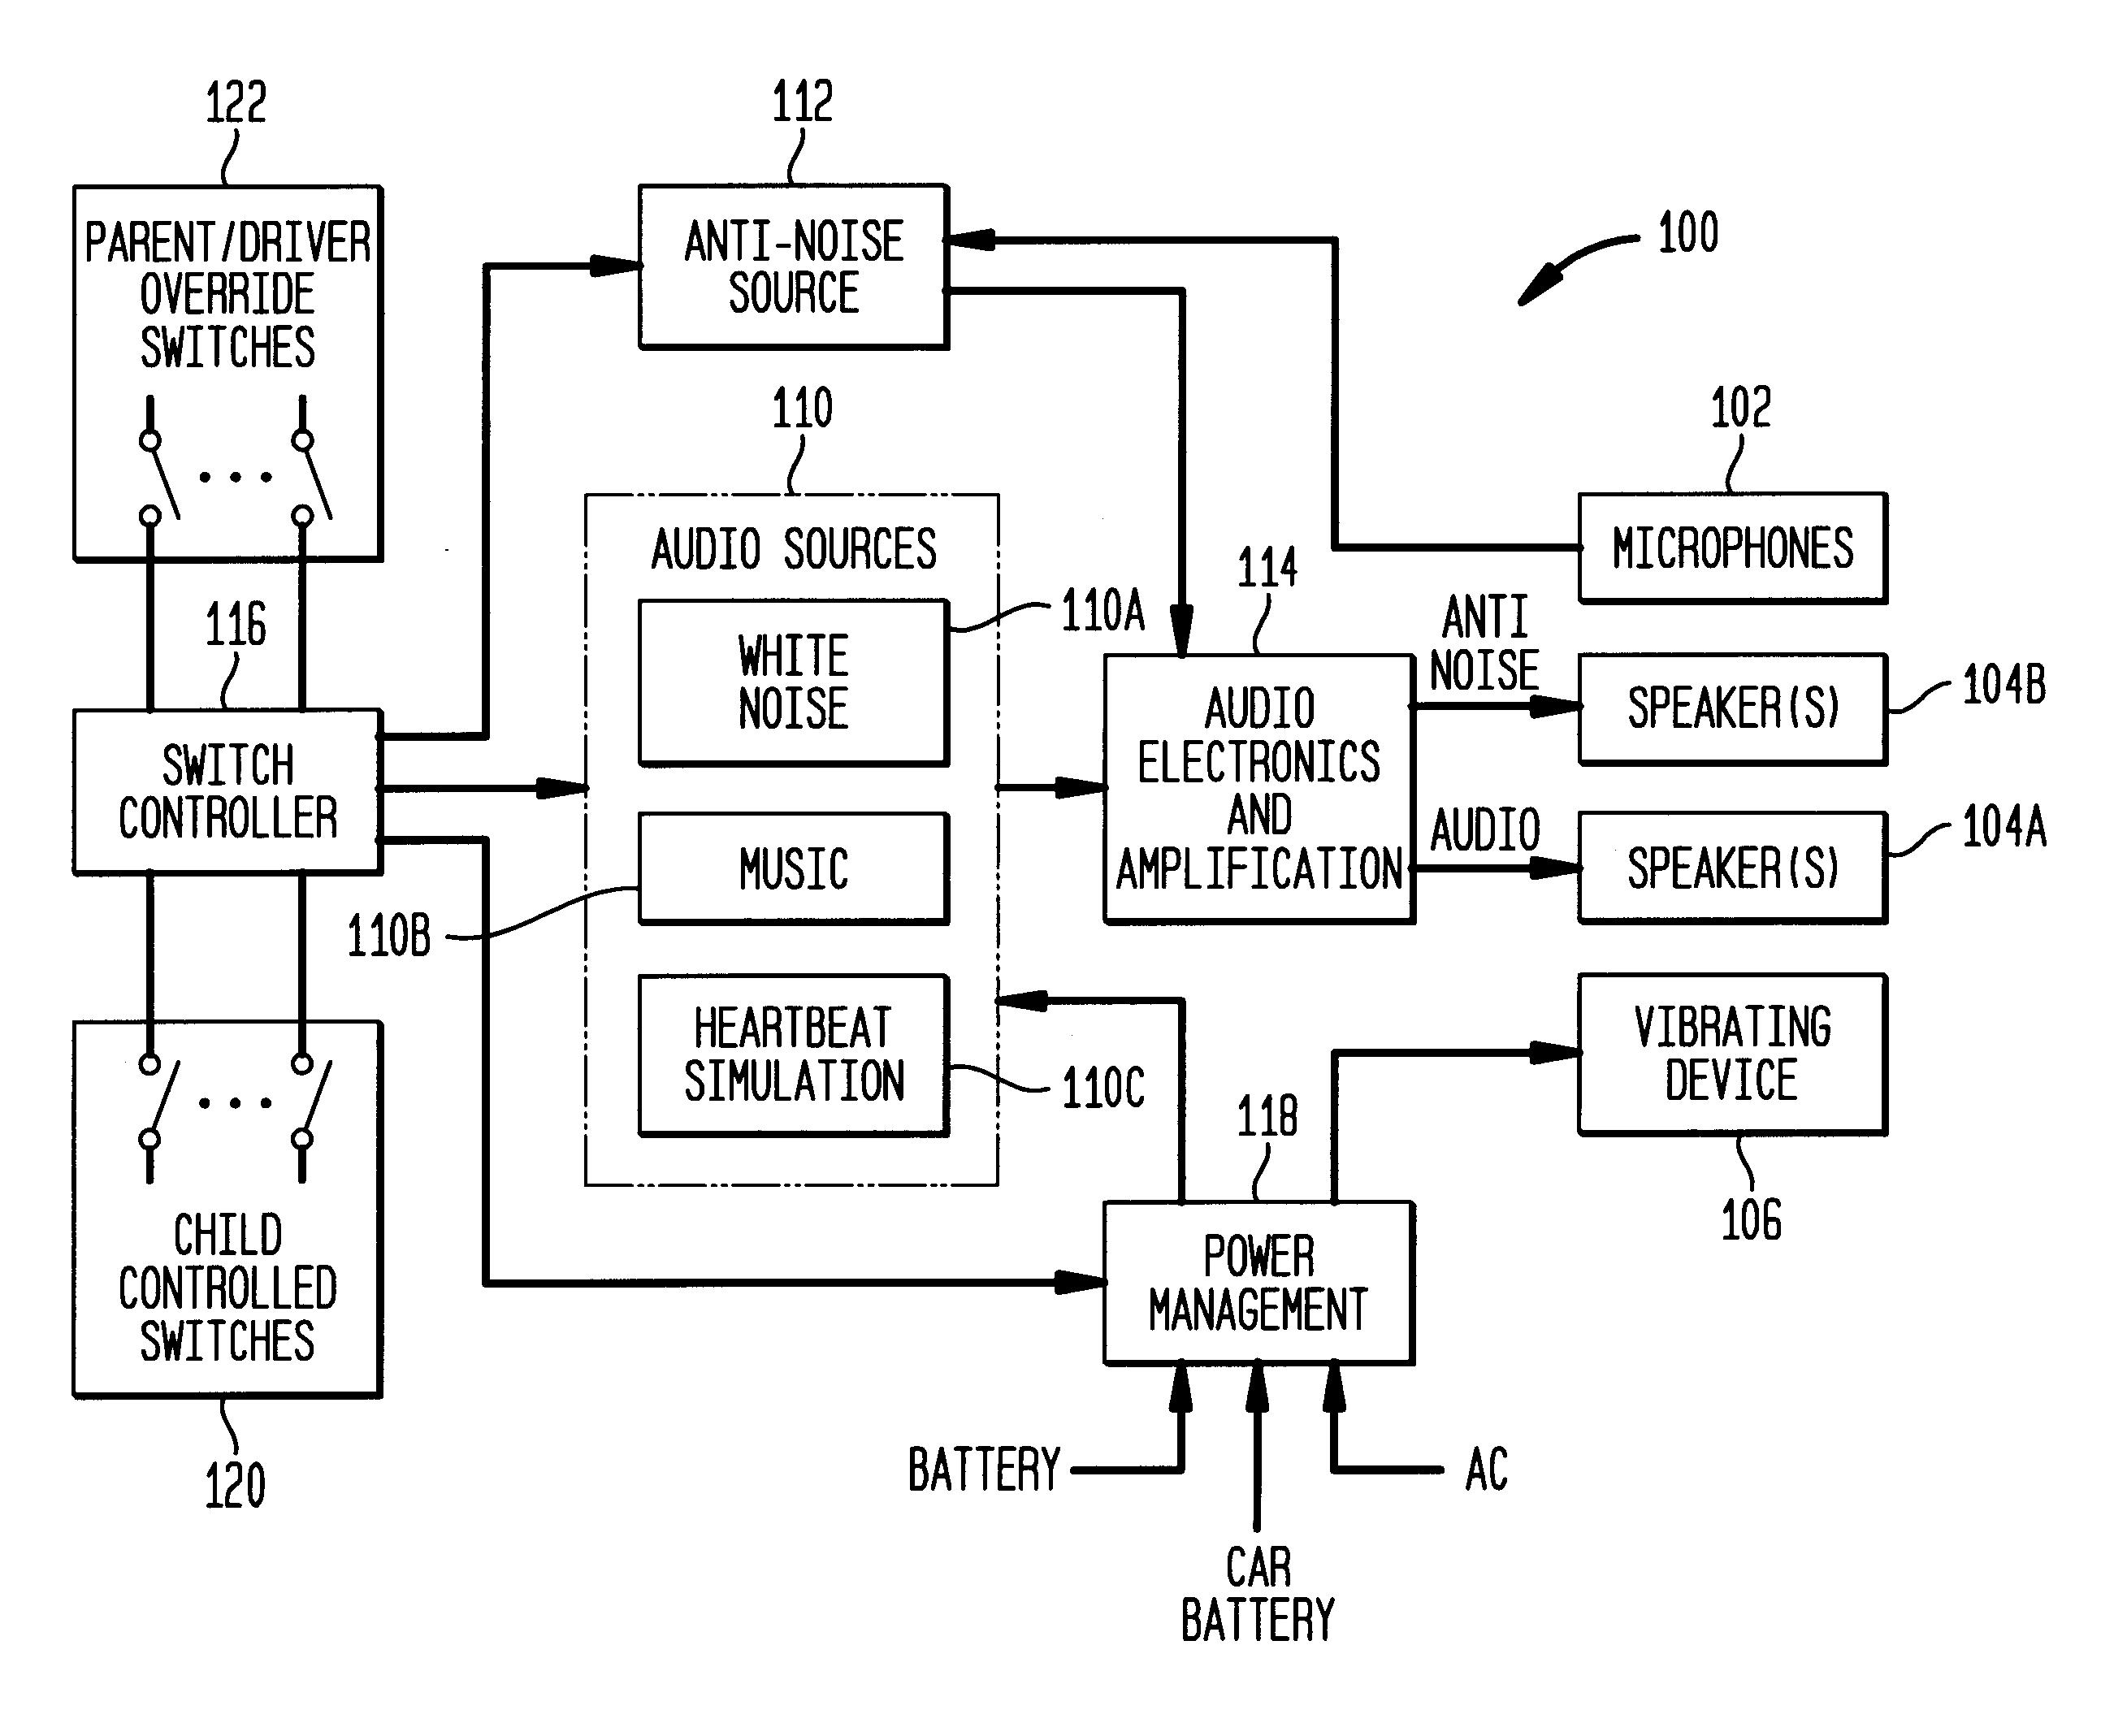 2001 delphi delco electronics wiring diagram wiring Automotive Wiring Schematics Automotive Wiring Schematics